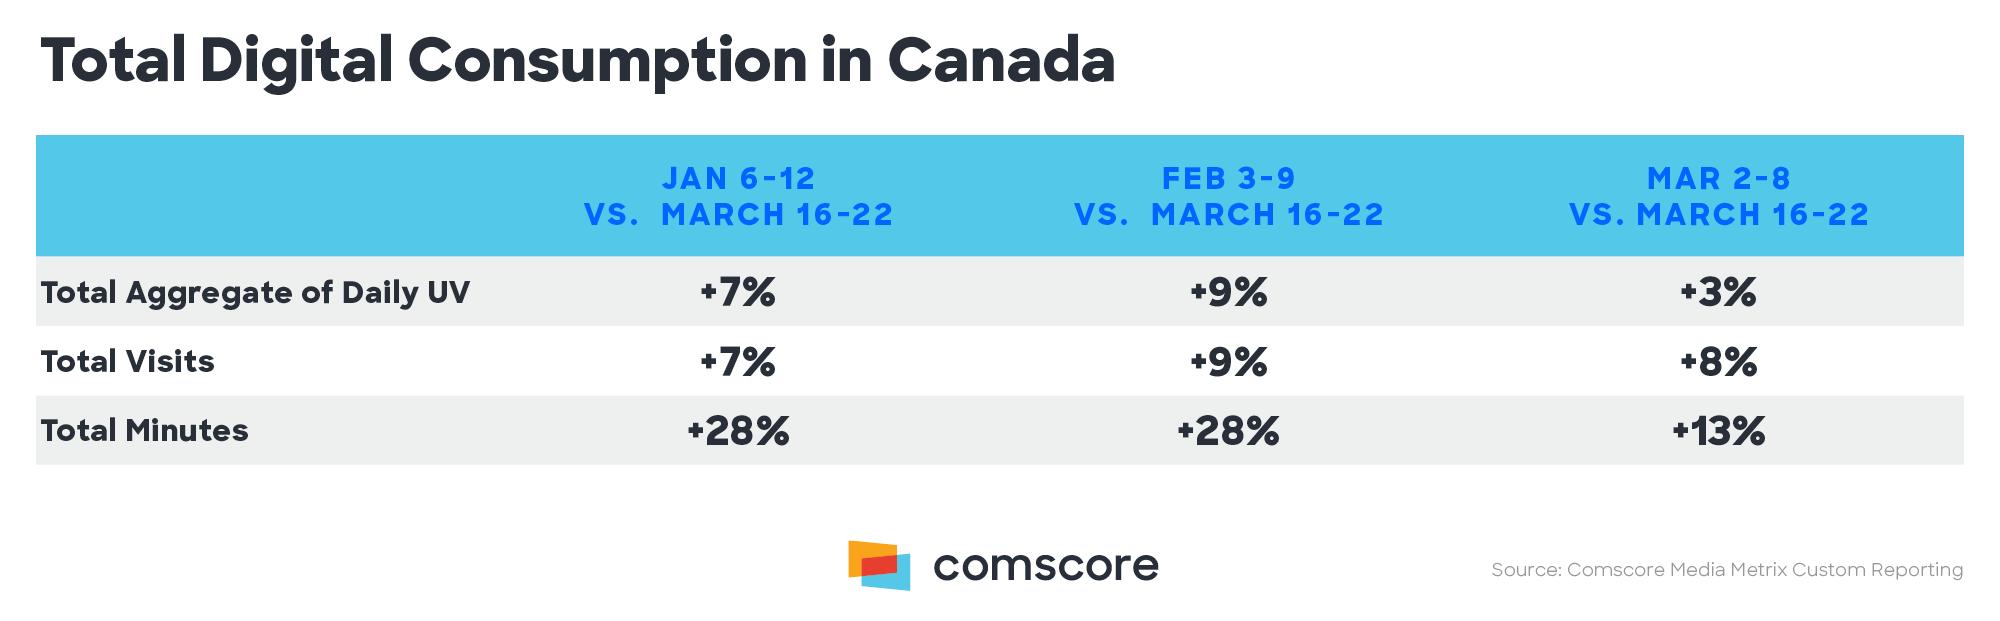 Total Digital Consumption in Canada